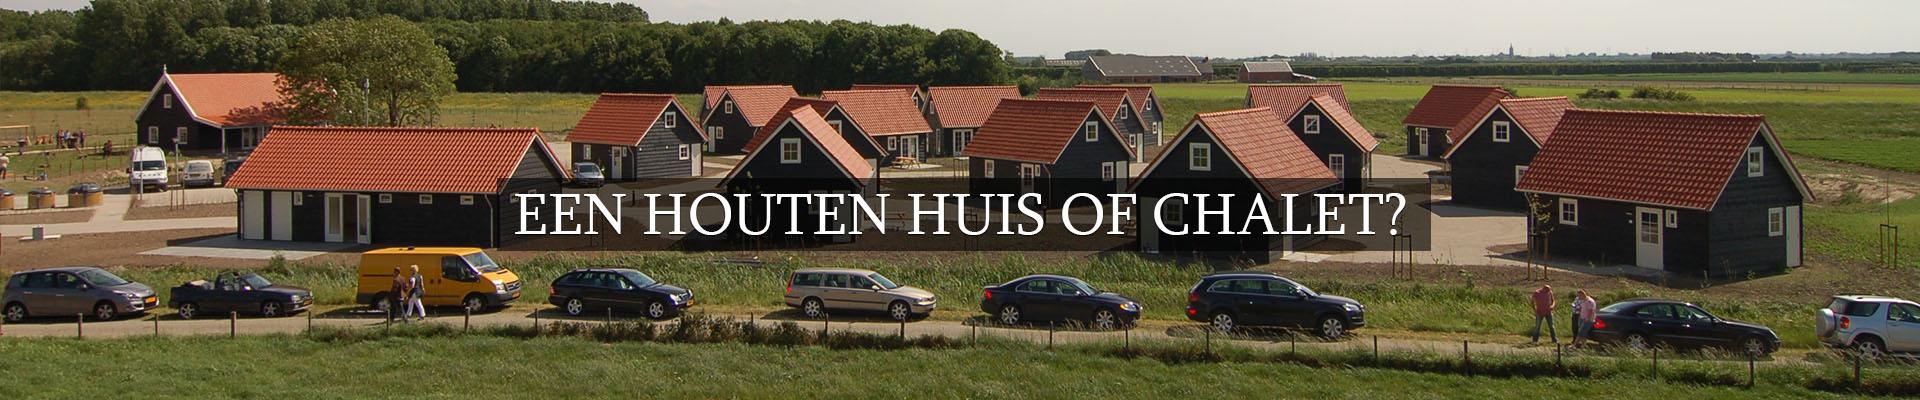 Olympa Houtbouw - Houten huis of chalet 1